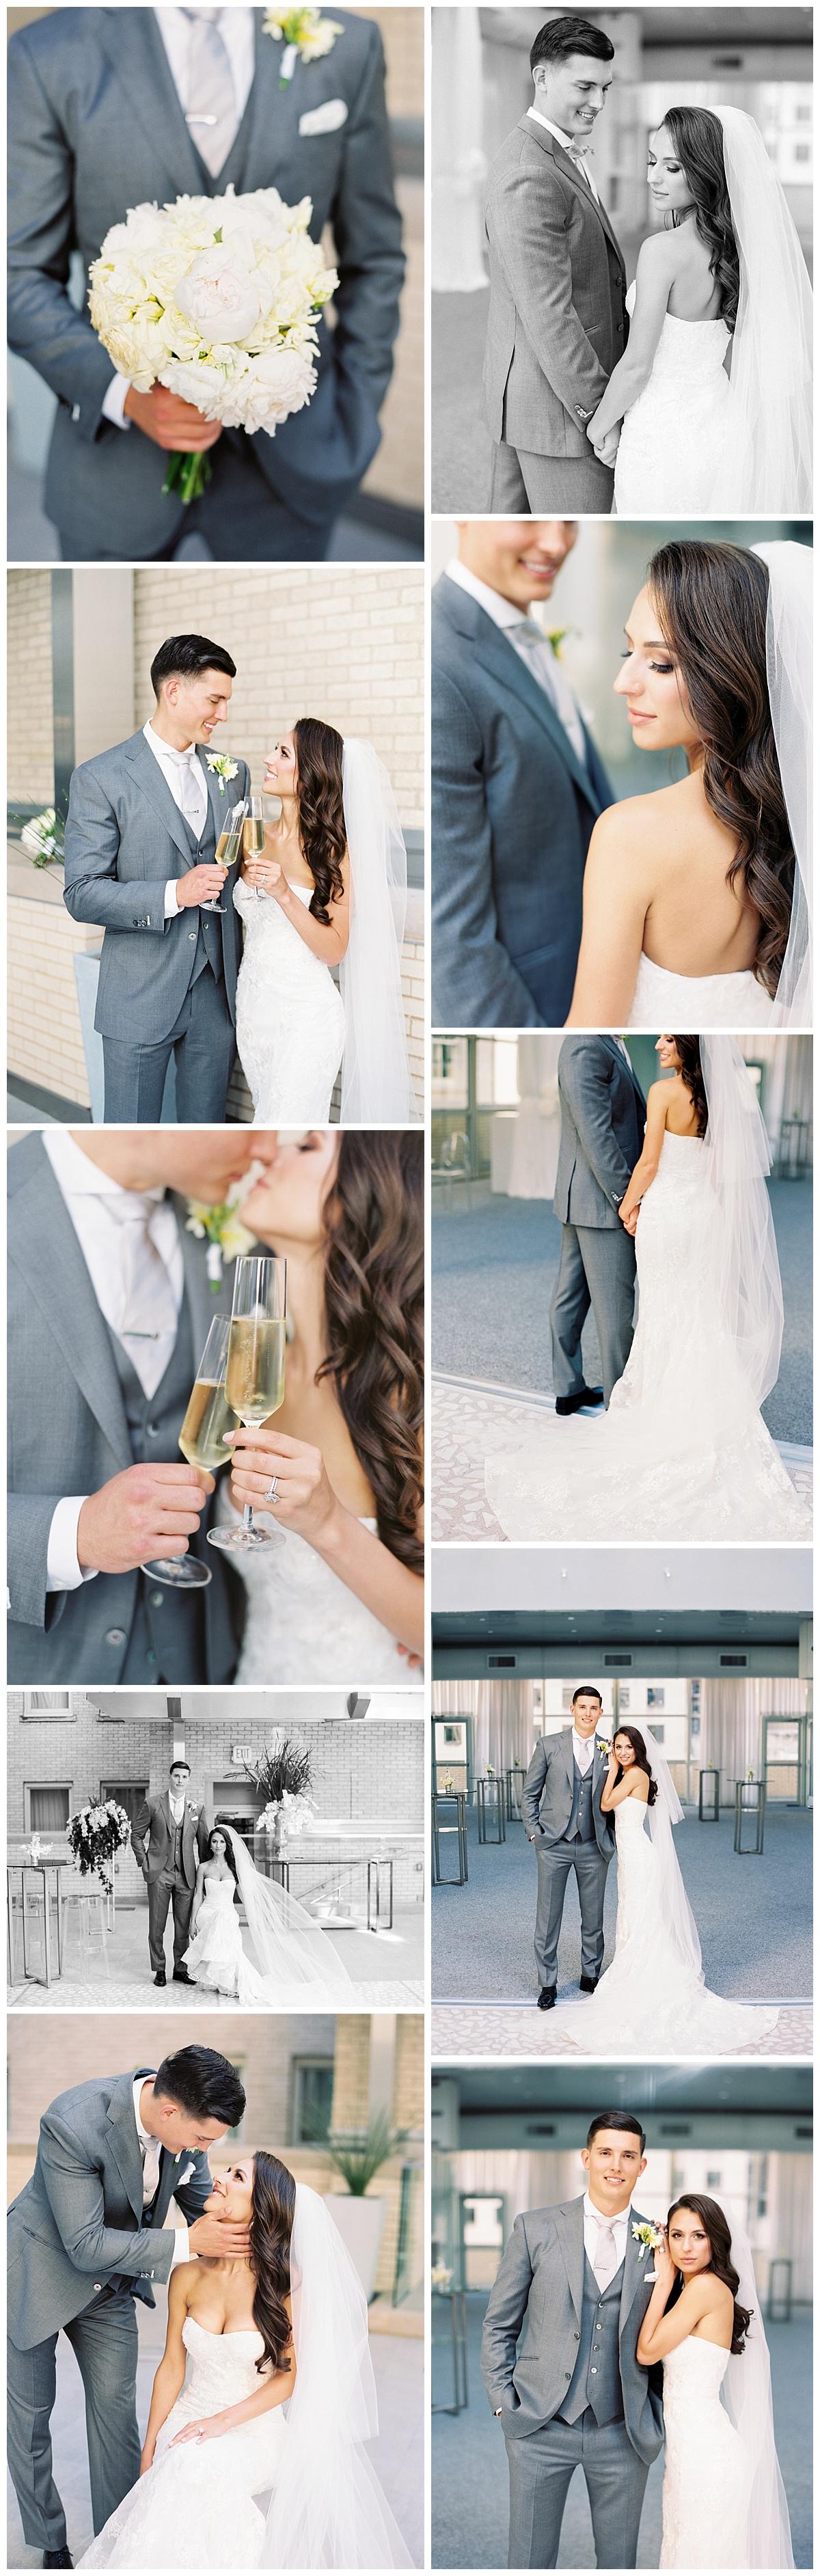 the-joule-dallas-wedding-ar-photography-7.jpg